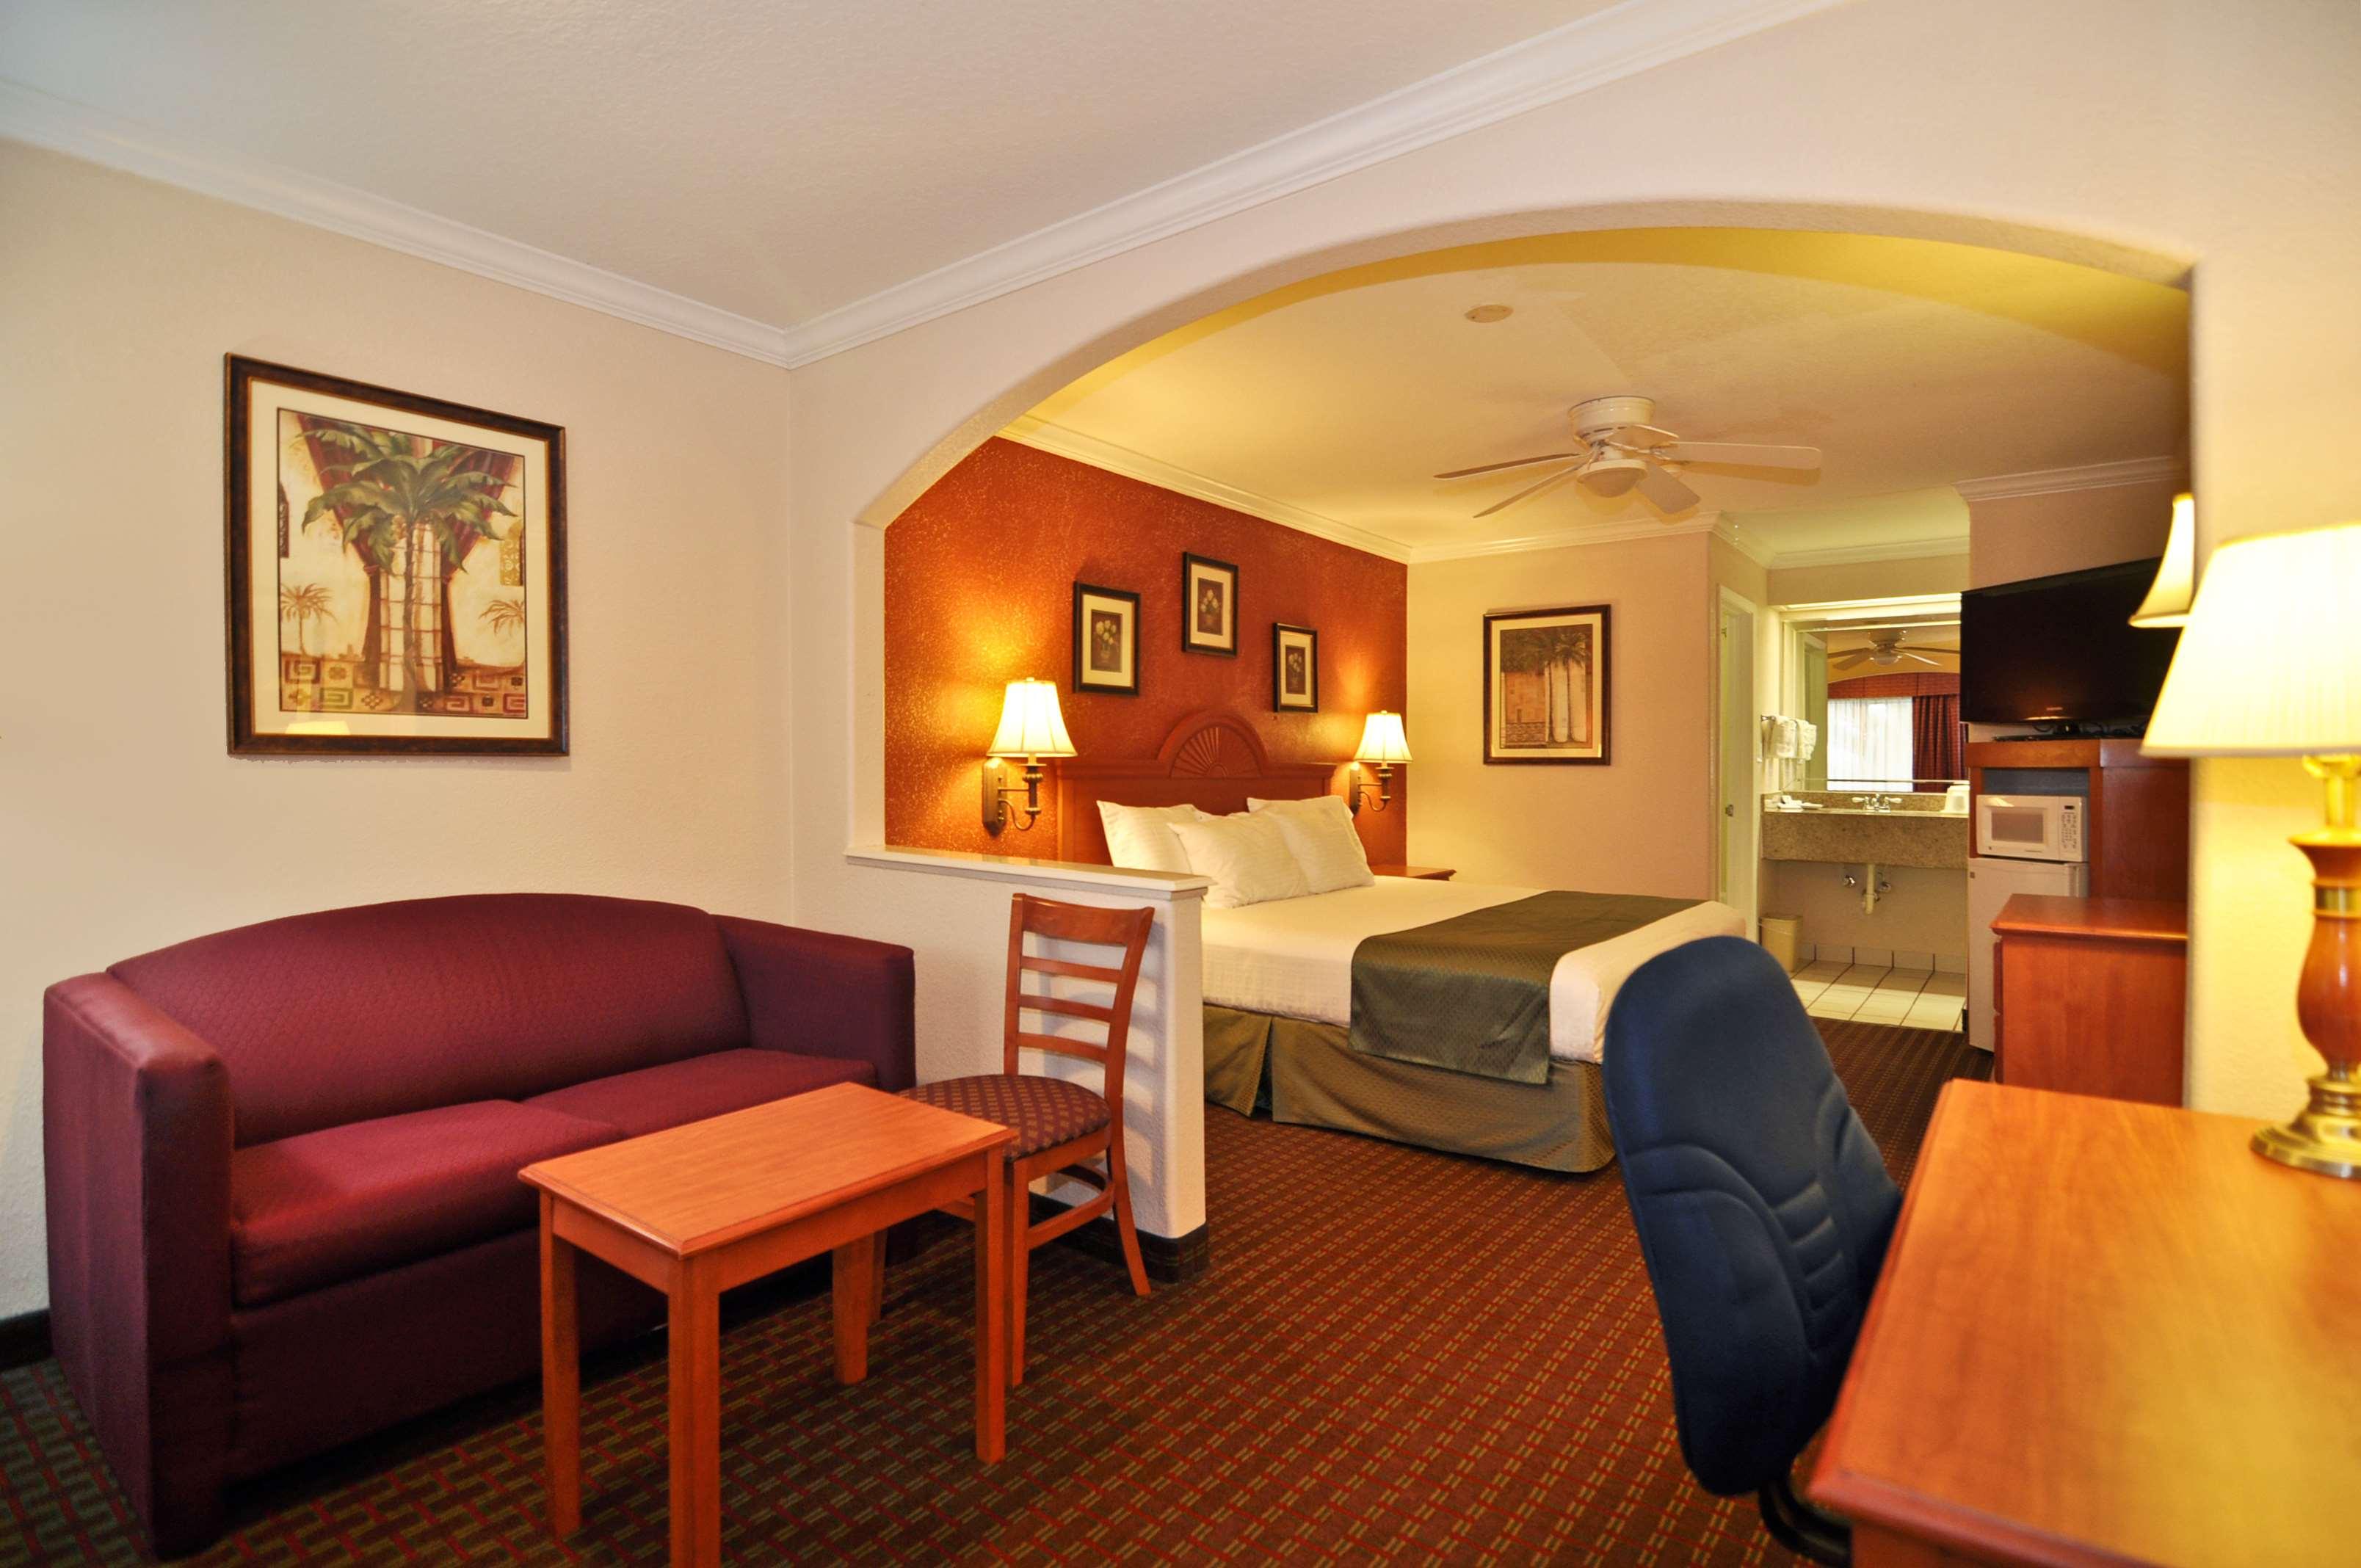 Best Western Pearland Inn image 5